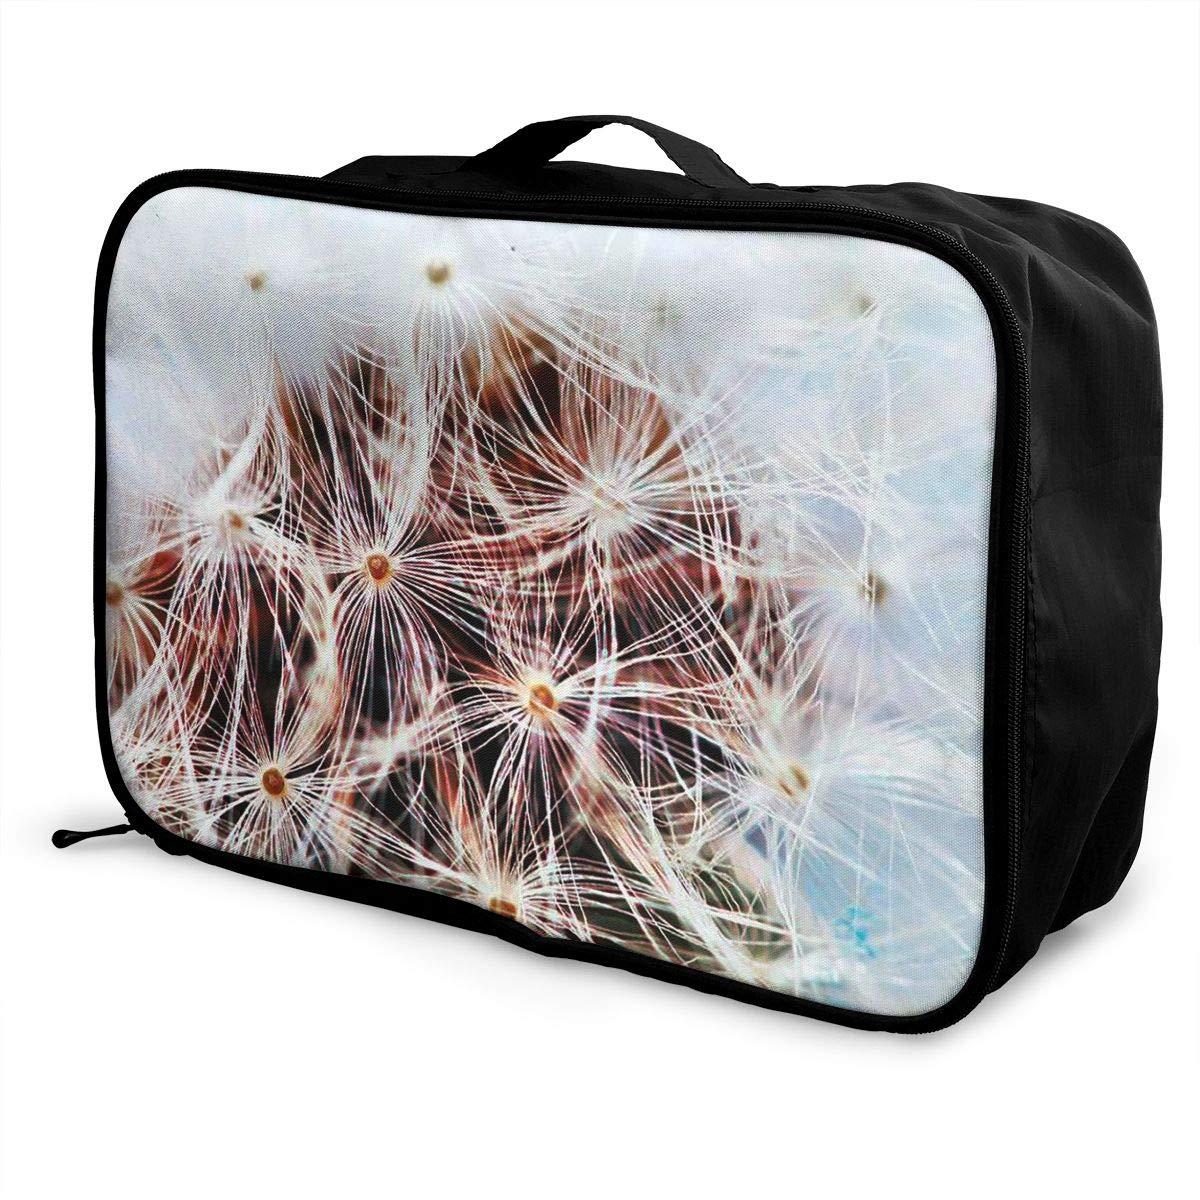 Travel Luggage Duffle Bag Lightweight Portable Handbag Dandelion Print Large Capacity Waterproof Foldable Storage Tote